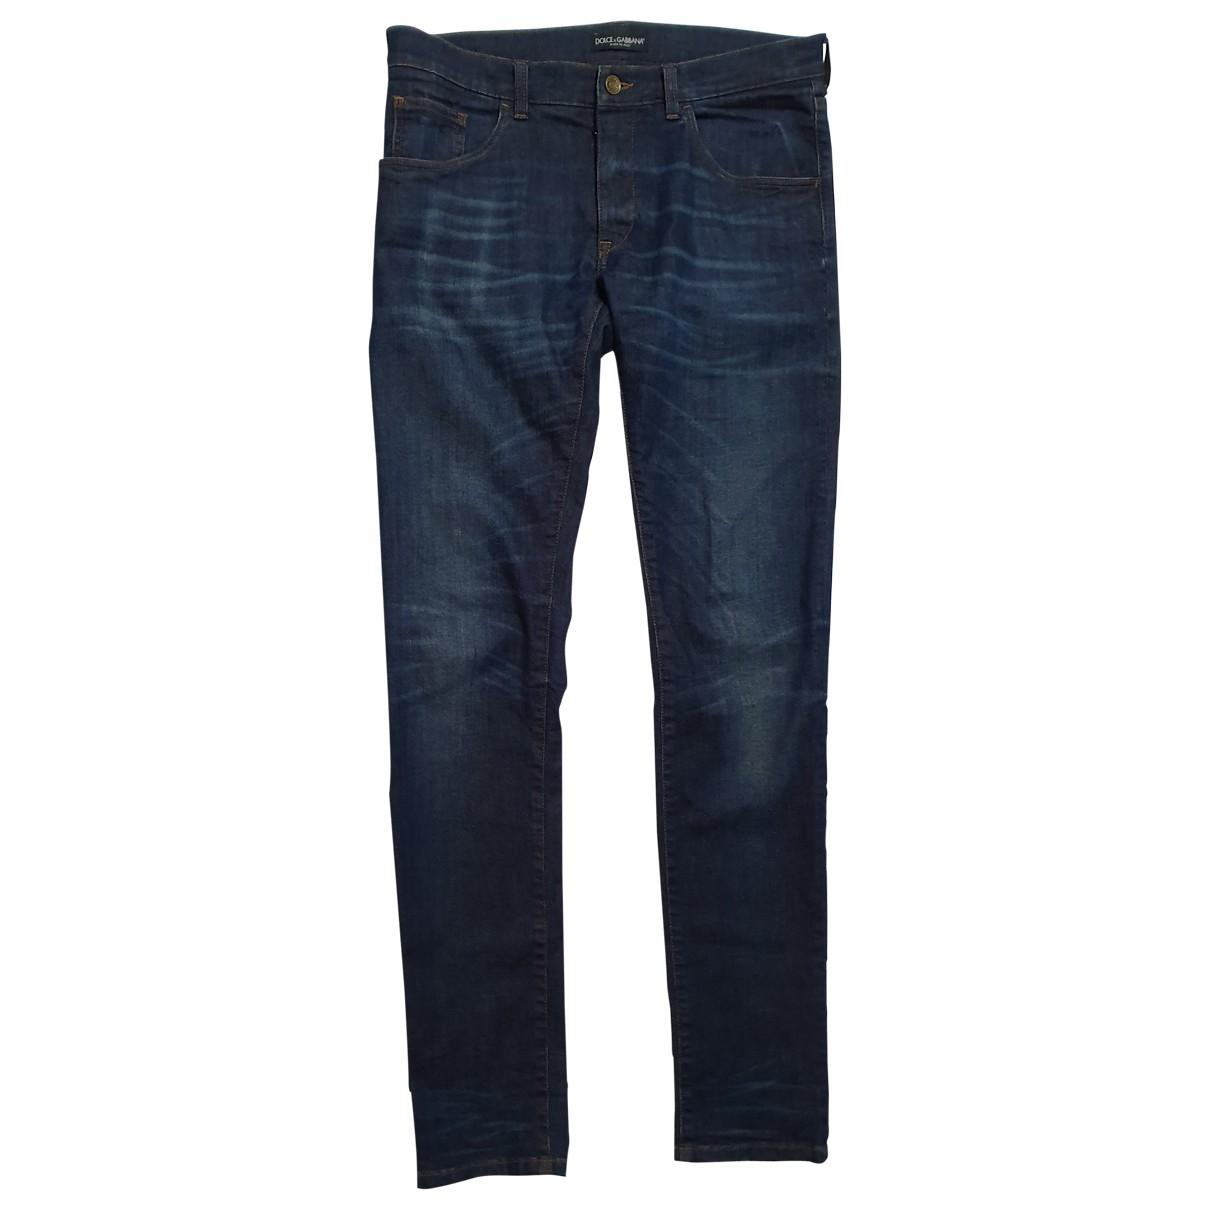 Dolce & Gabbana \N Blue Cotton - elasthane Jeans for Men 32 US